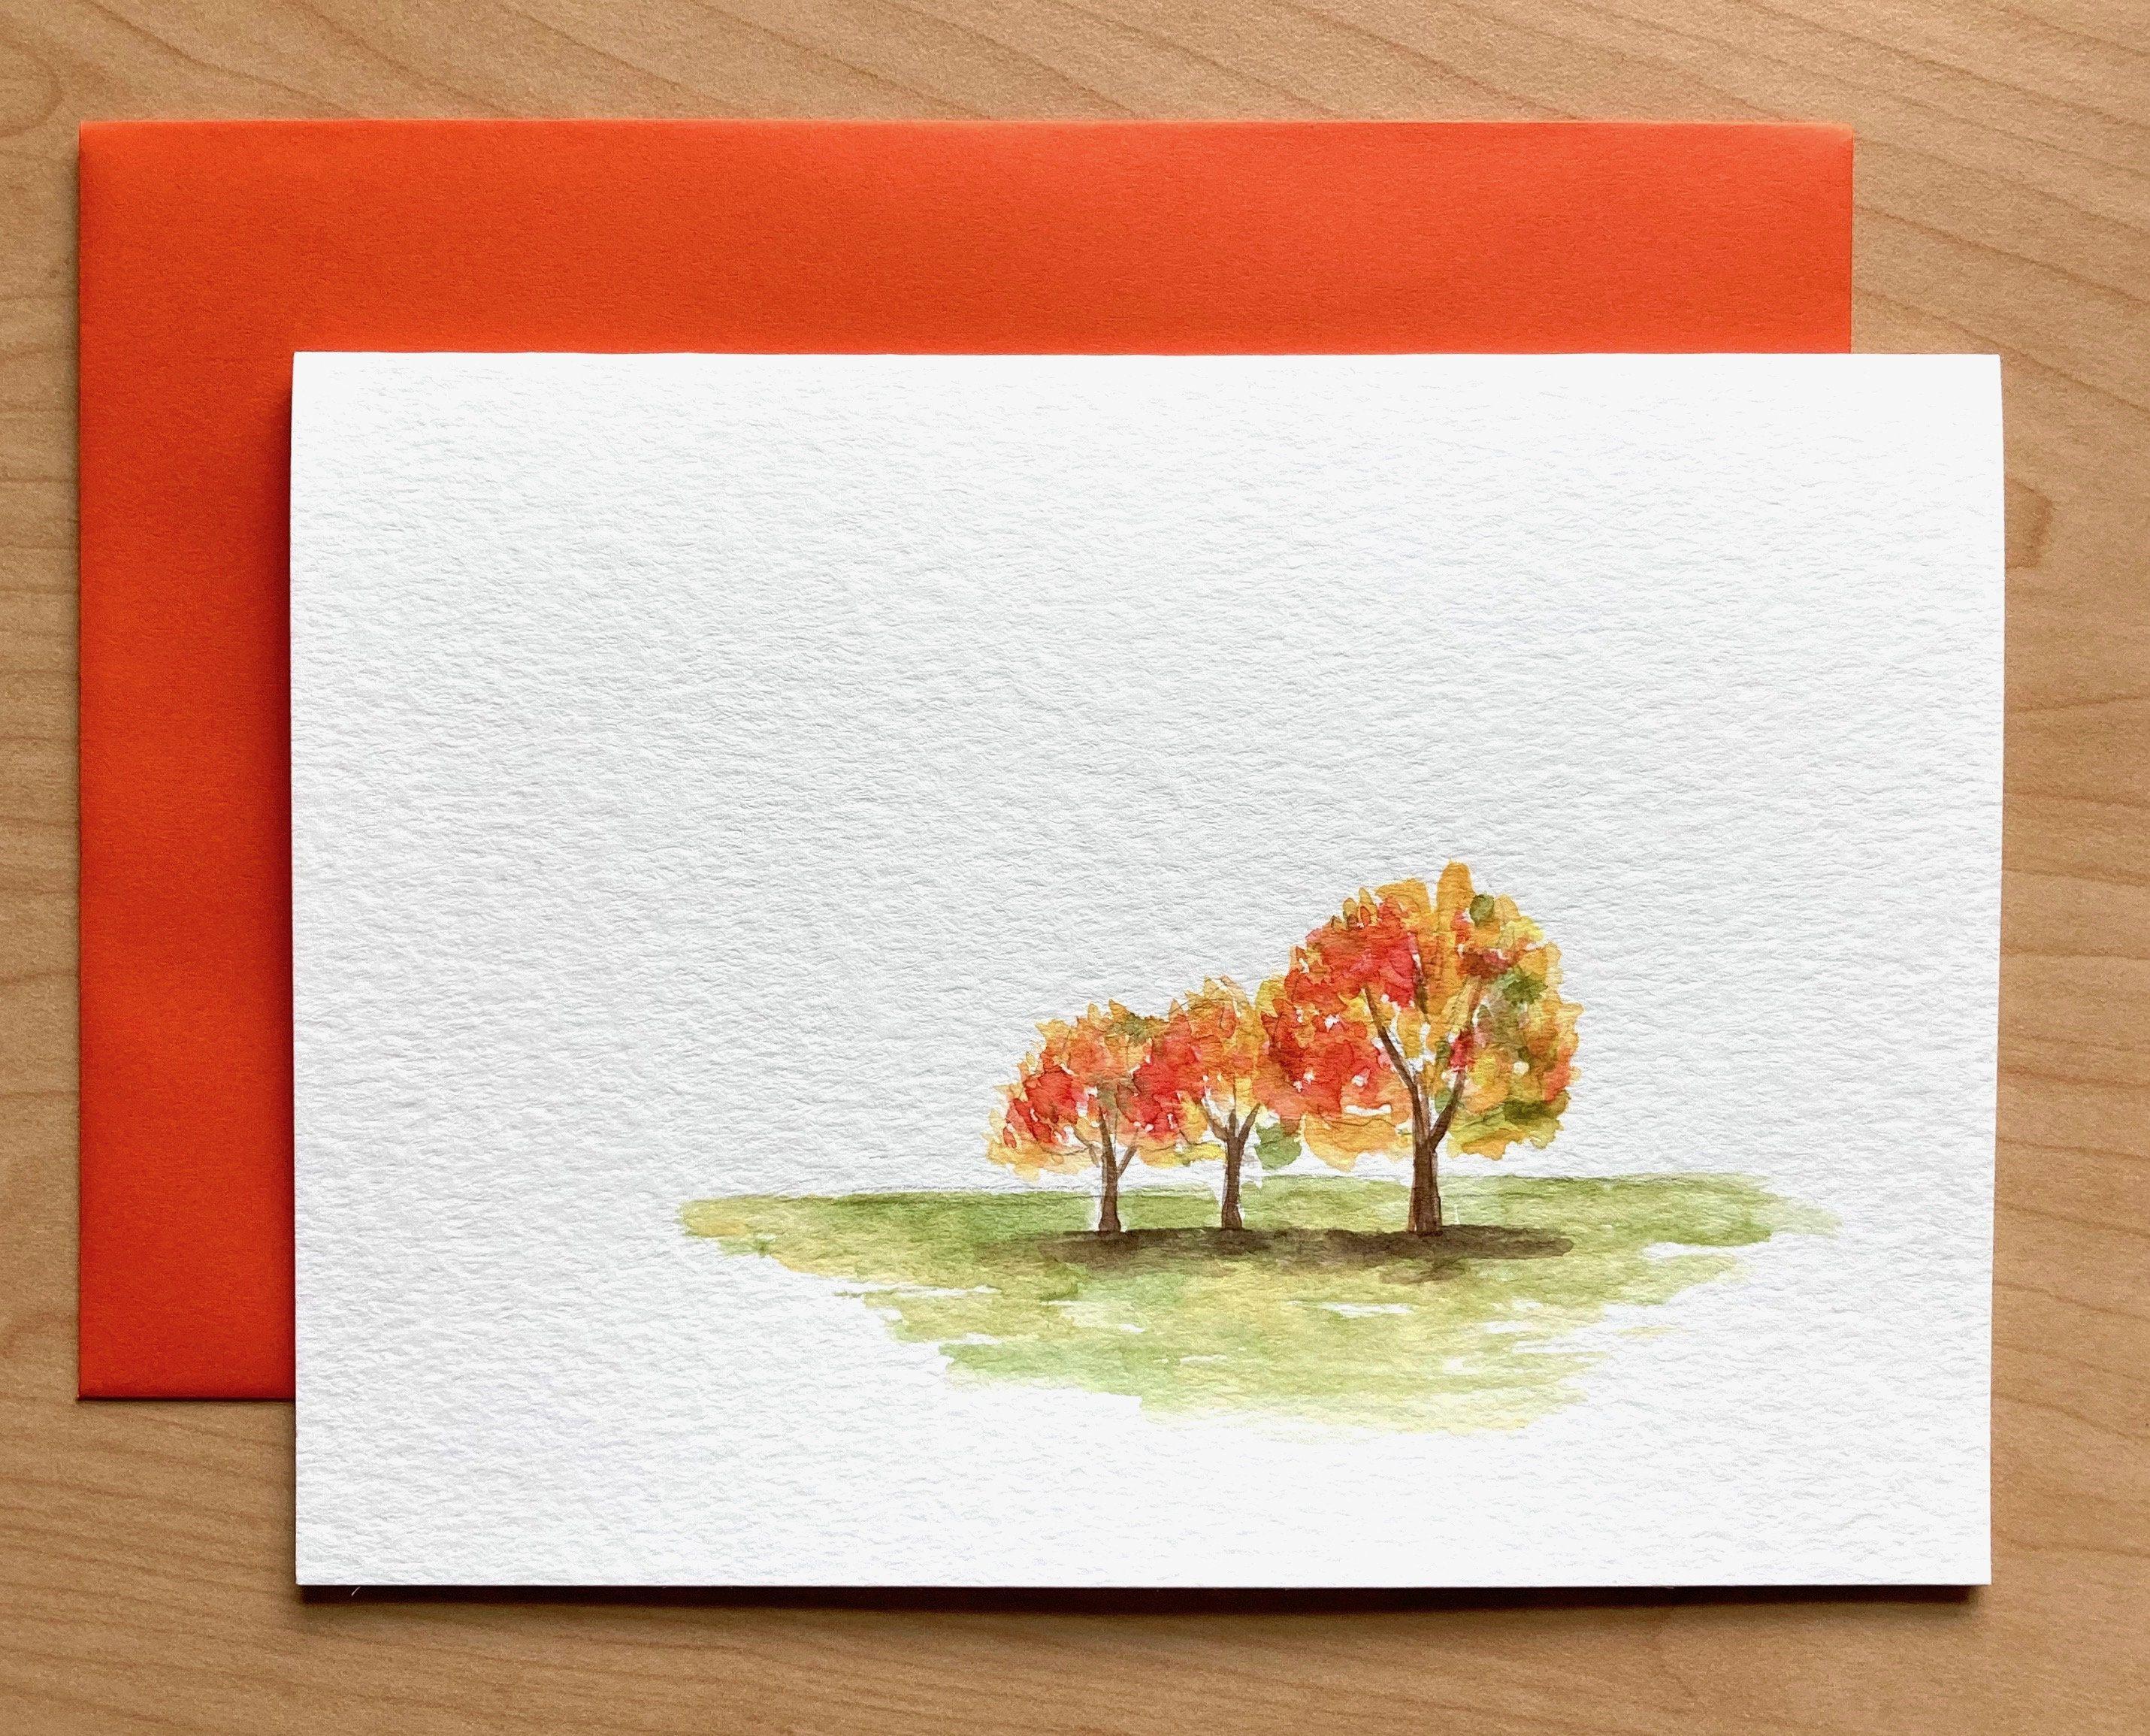 Frameable 5x7 Art Card wEnvelope Today Original Artwork